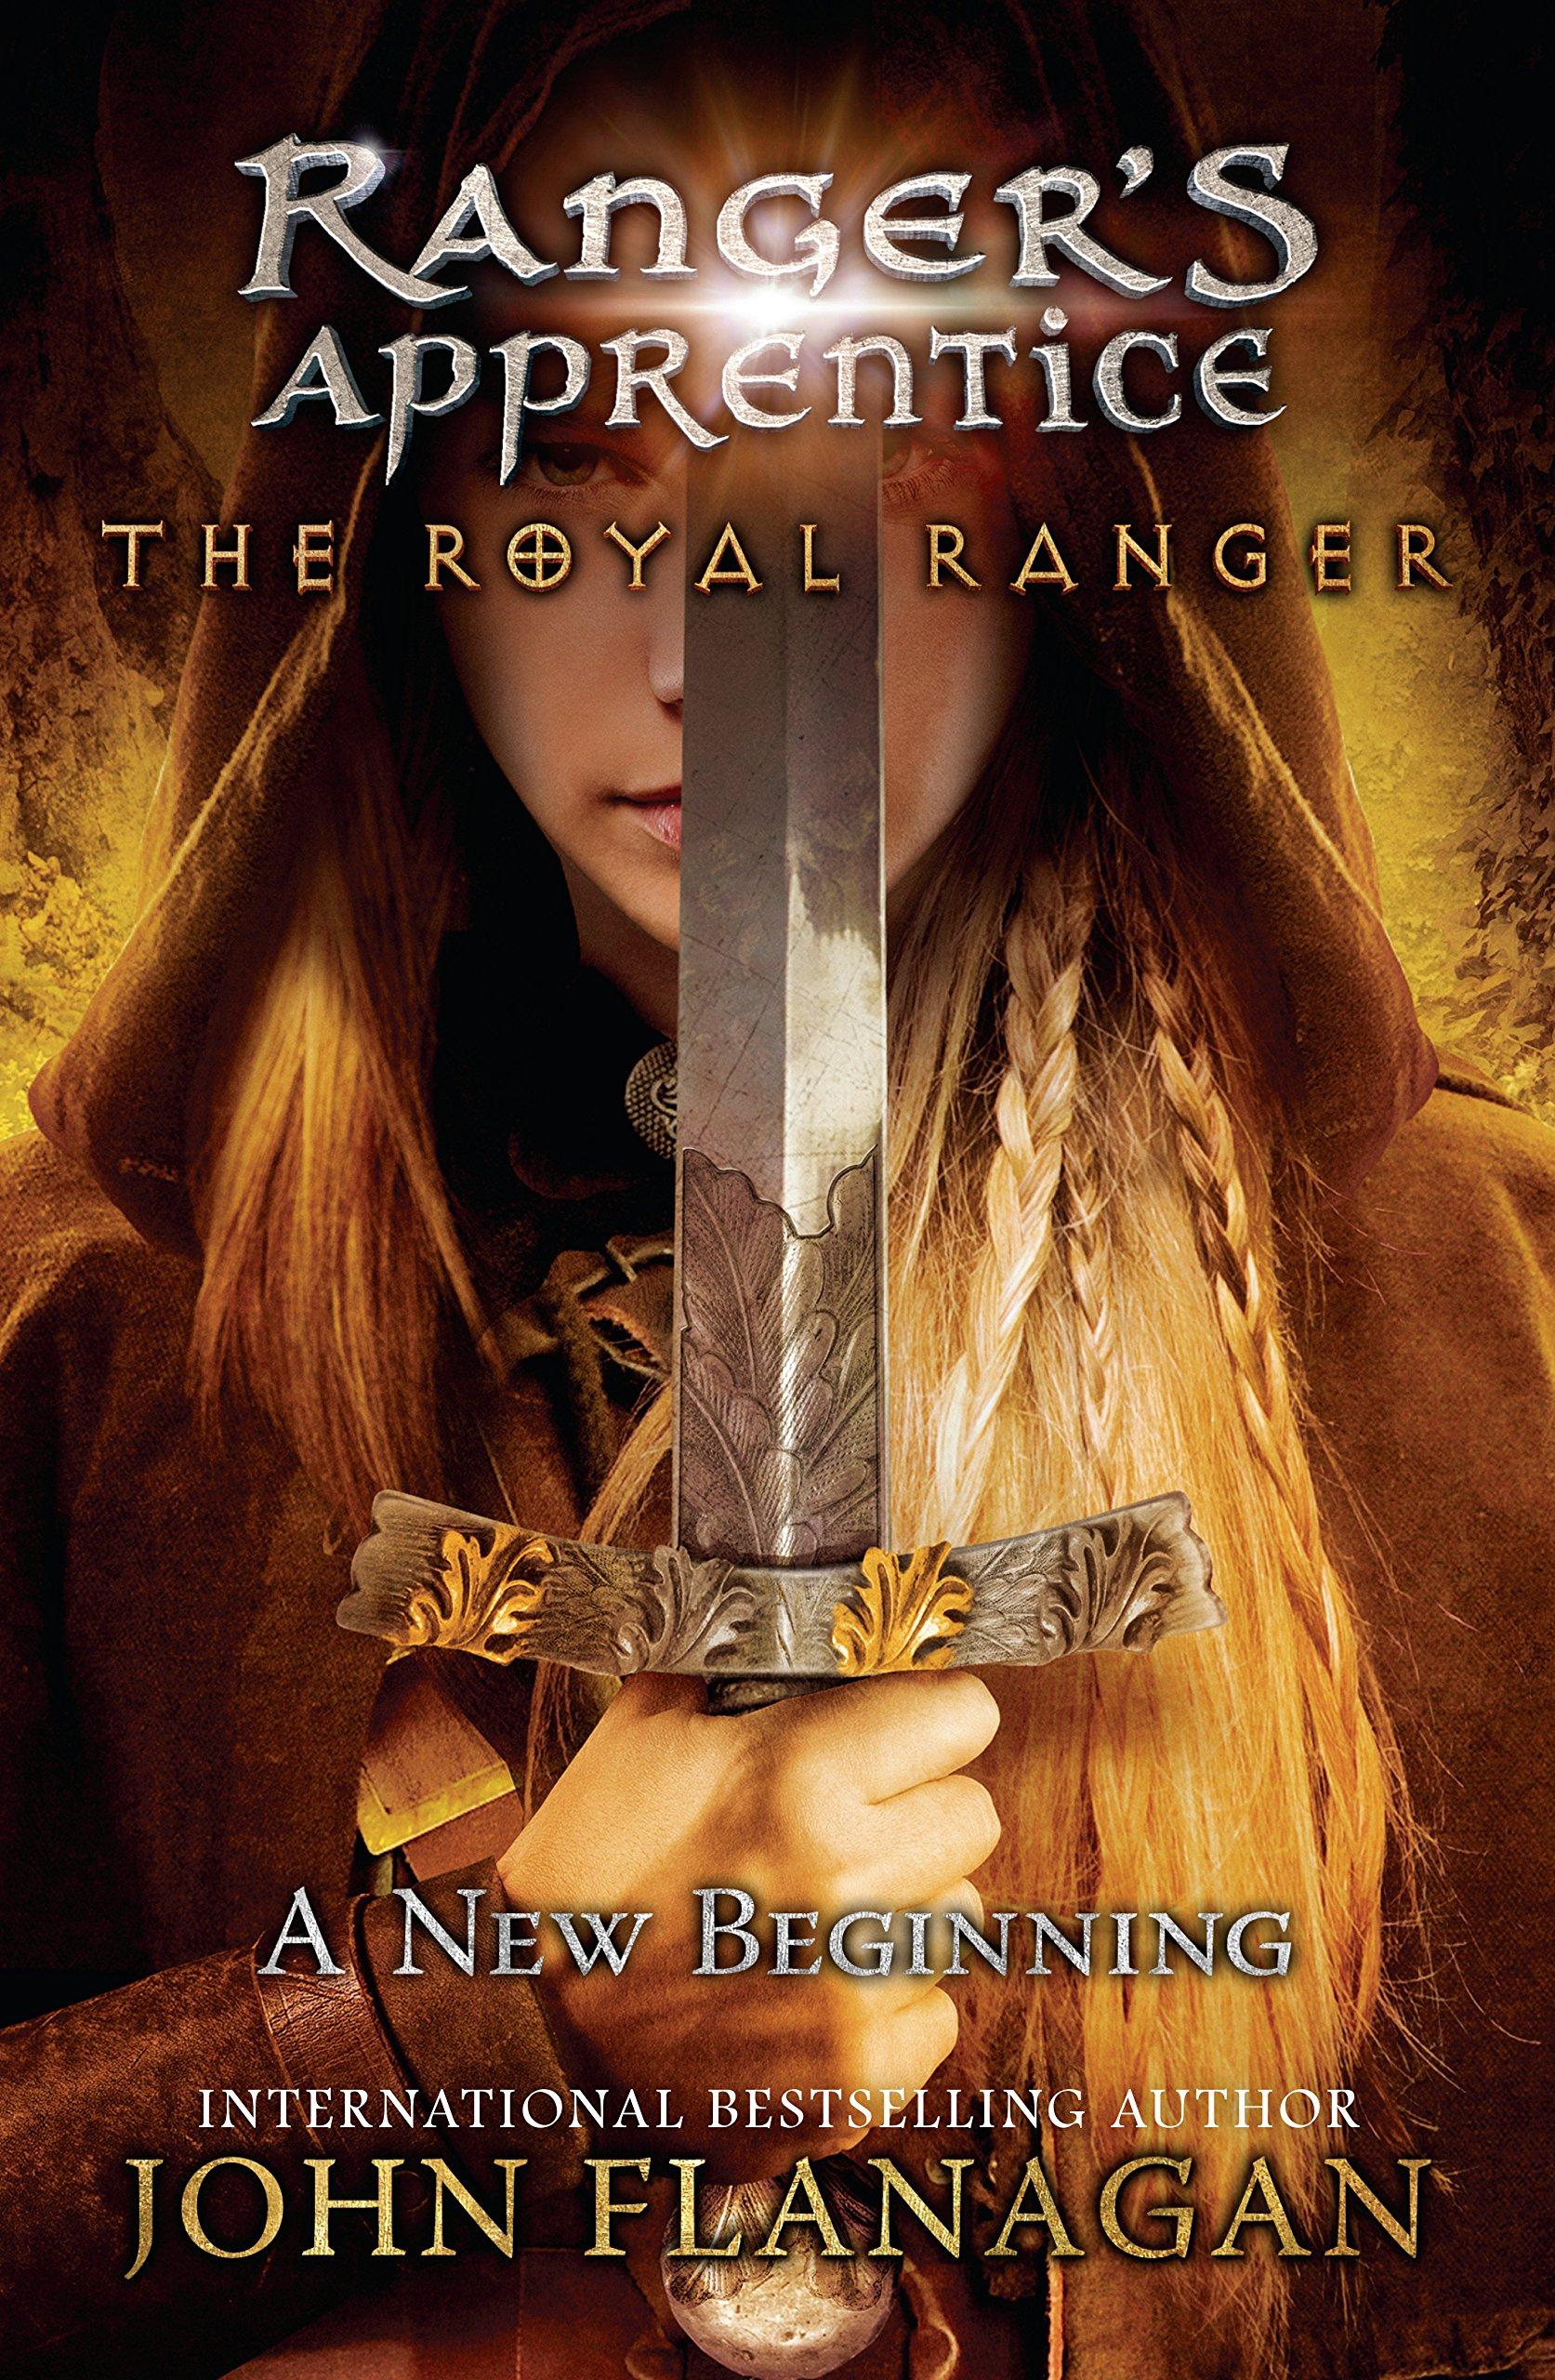 Ranger's Apprentice:  The Royal Ranger - John Flanagan